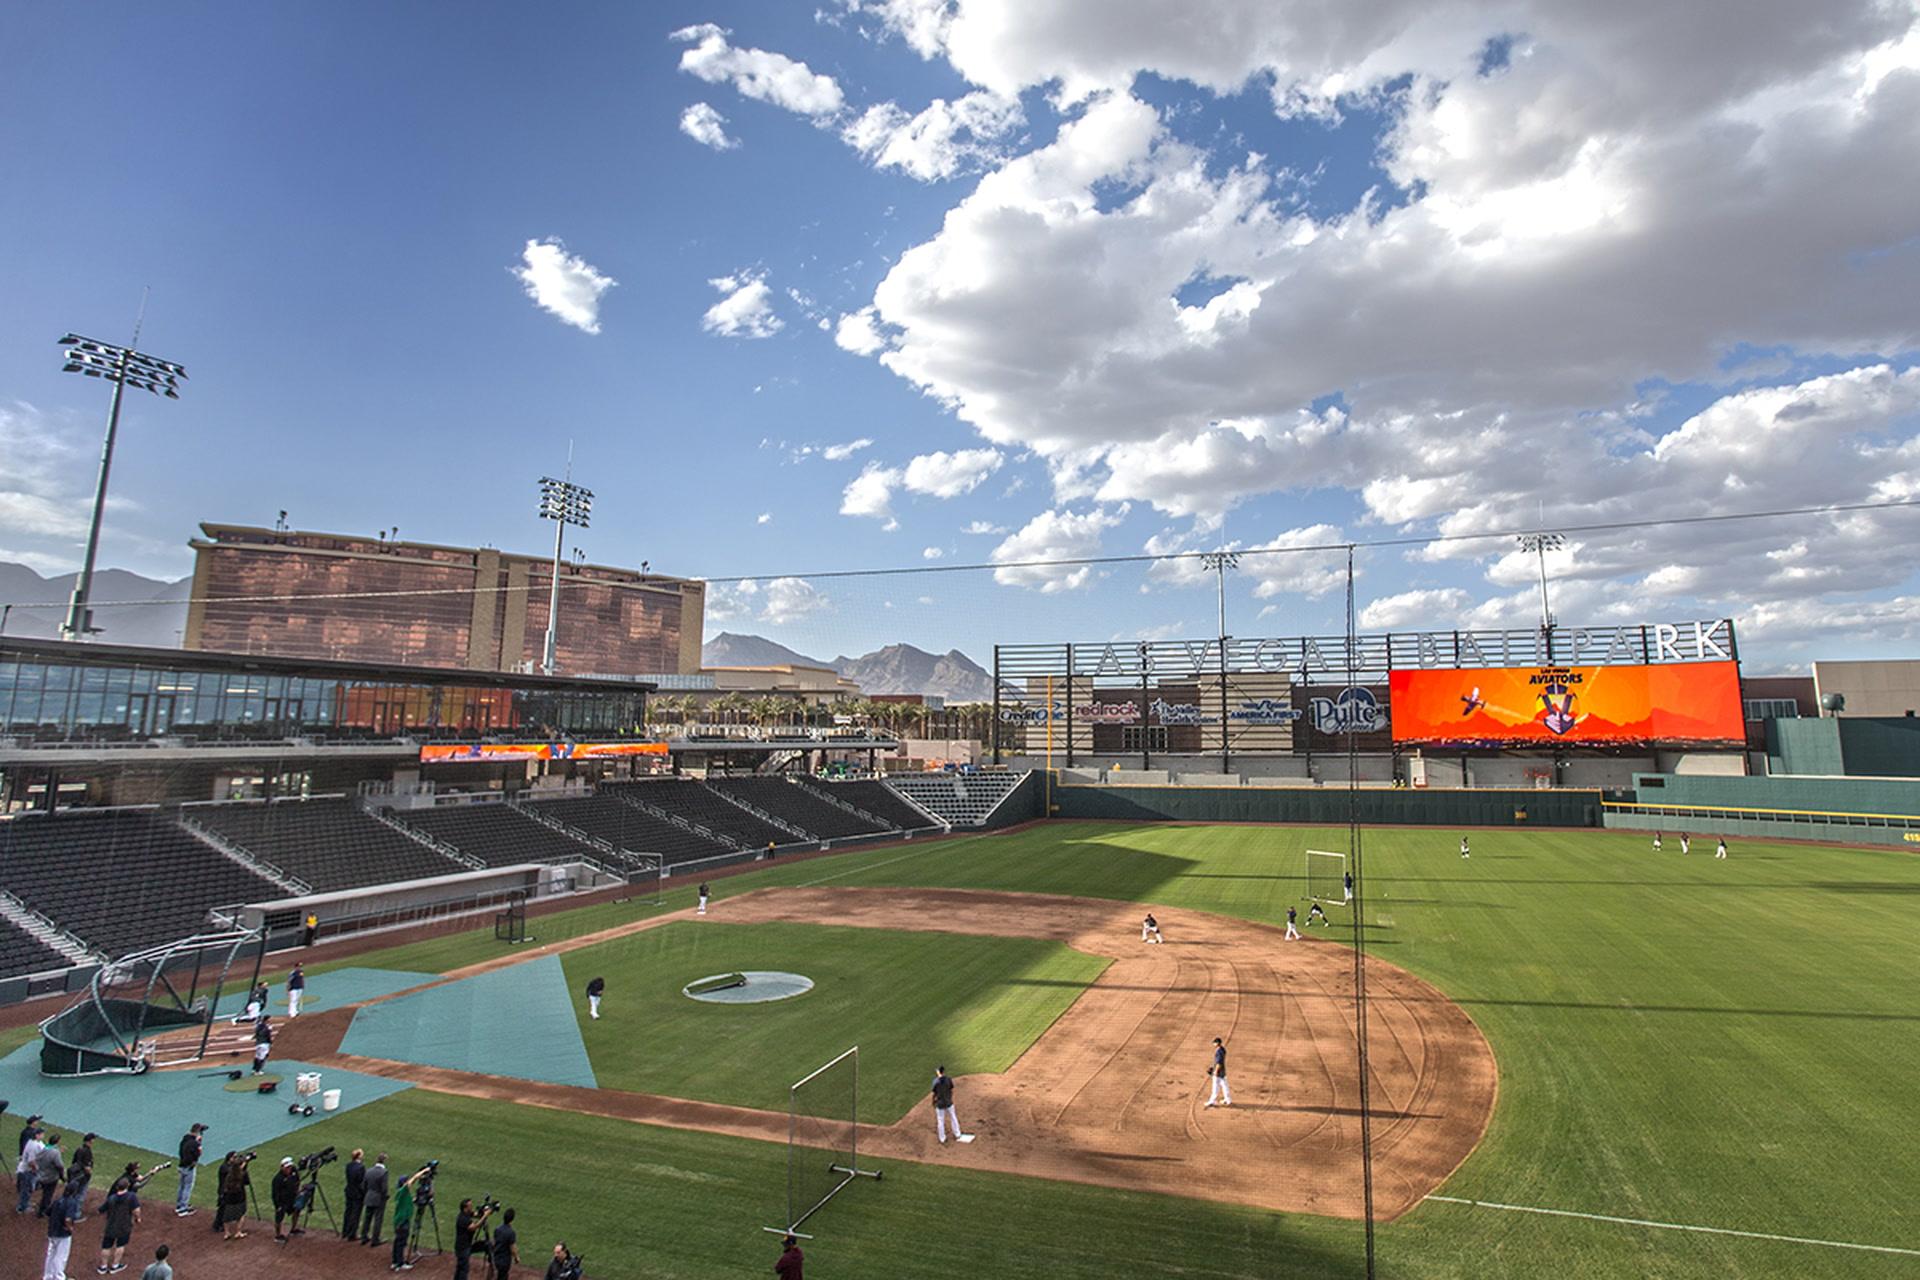 Sex in the baseball stadium video